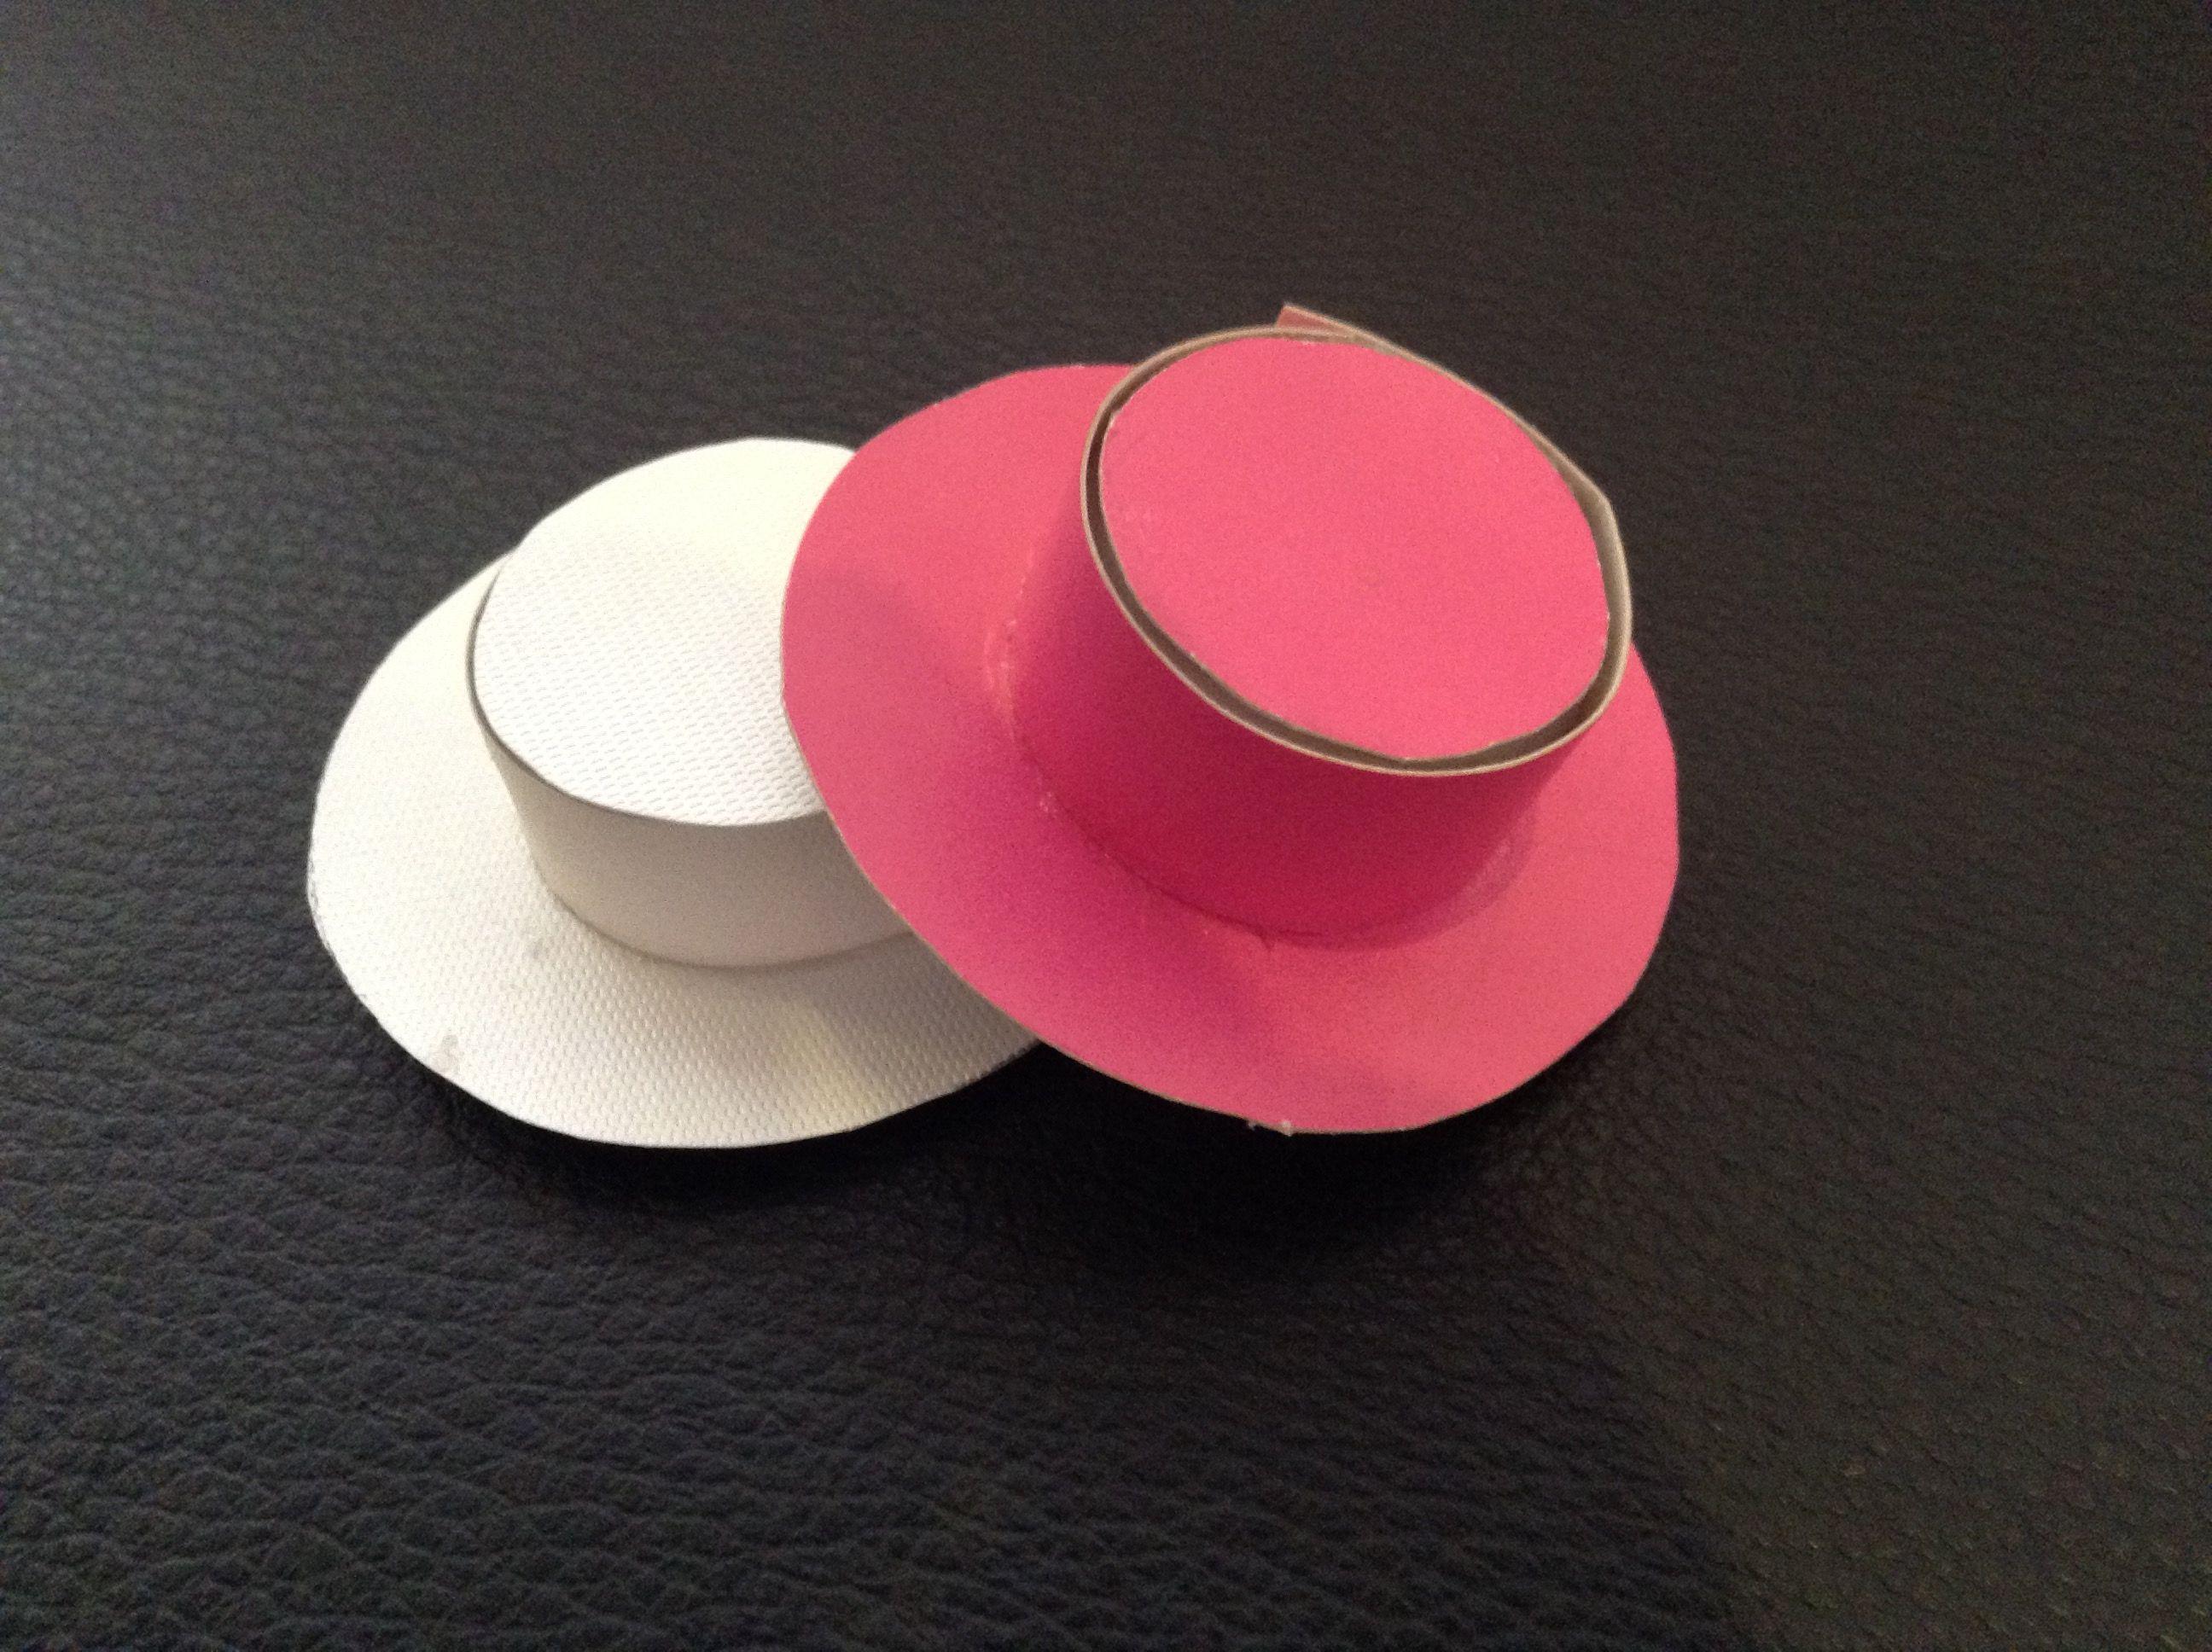 Ganchos em forma de chapéu. By Beatriz